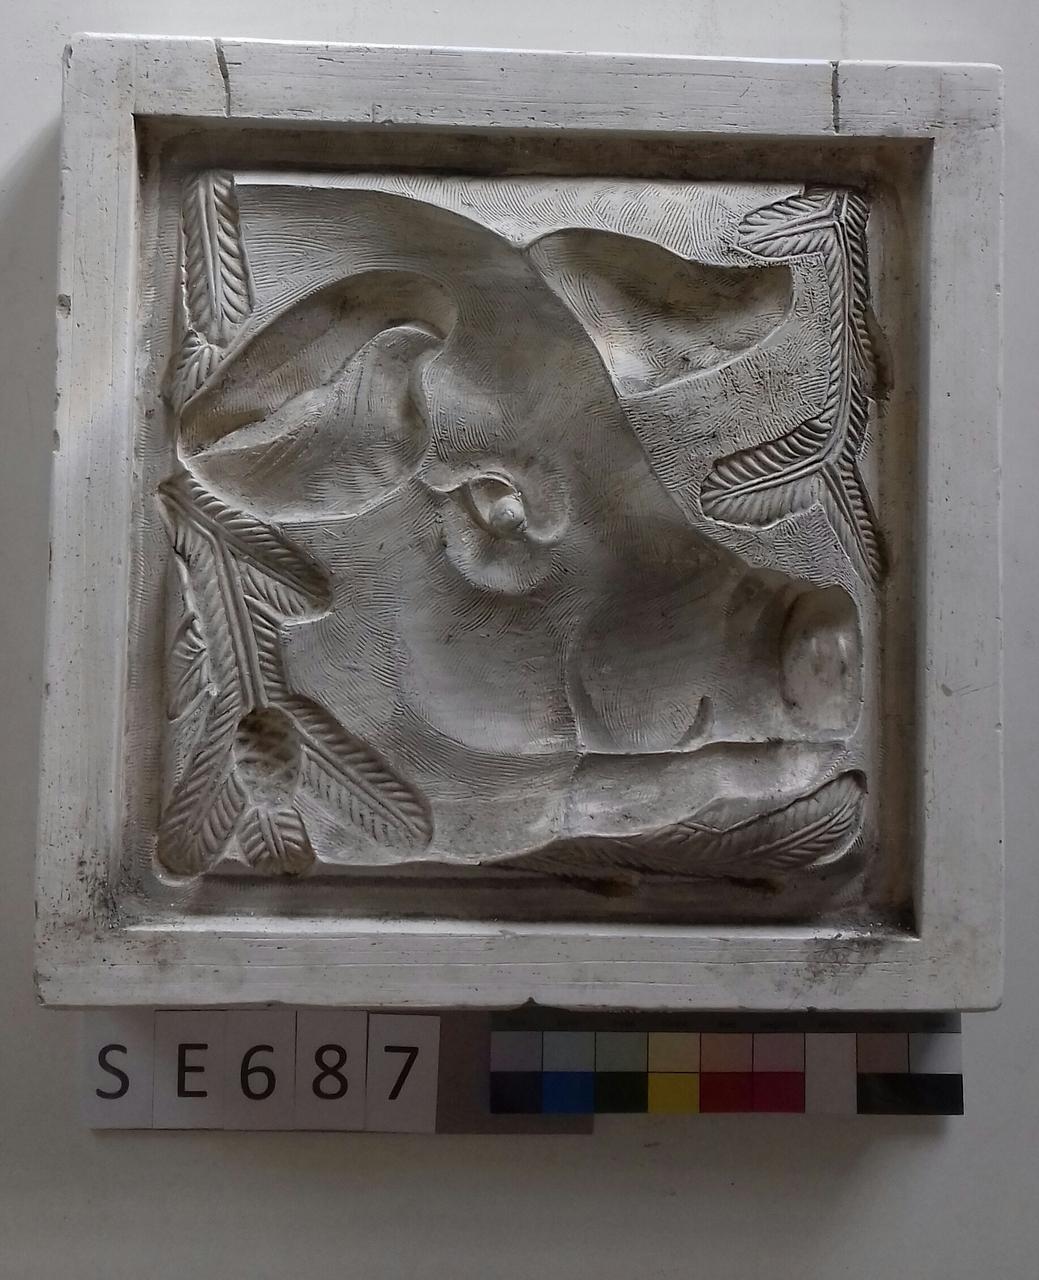 Negativteil ledige Kachel Schweinekopf